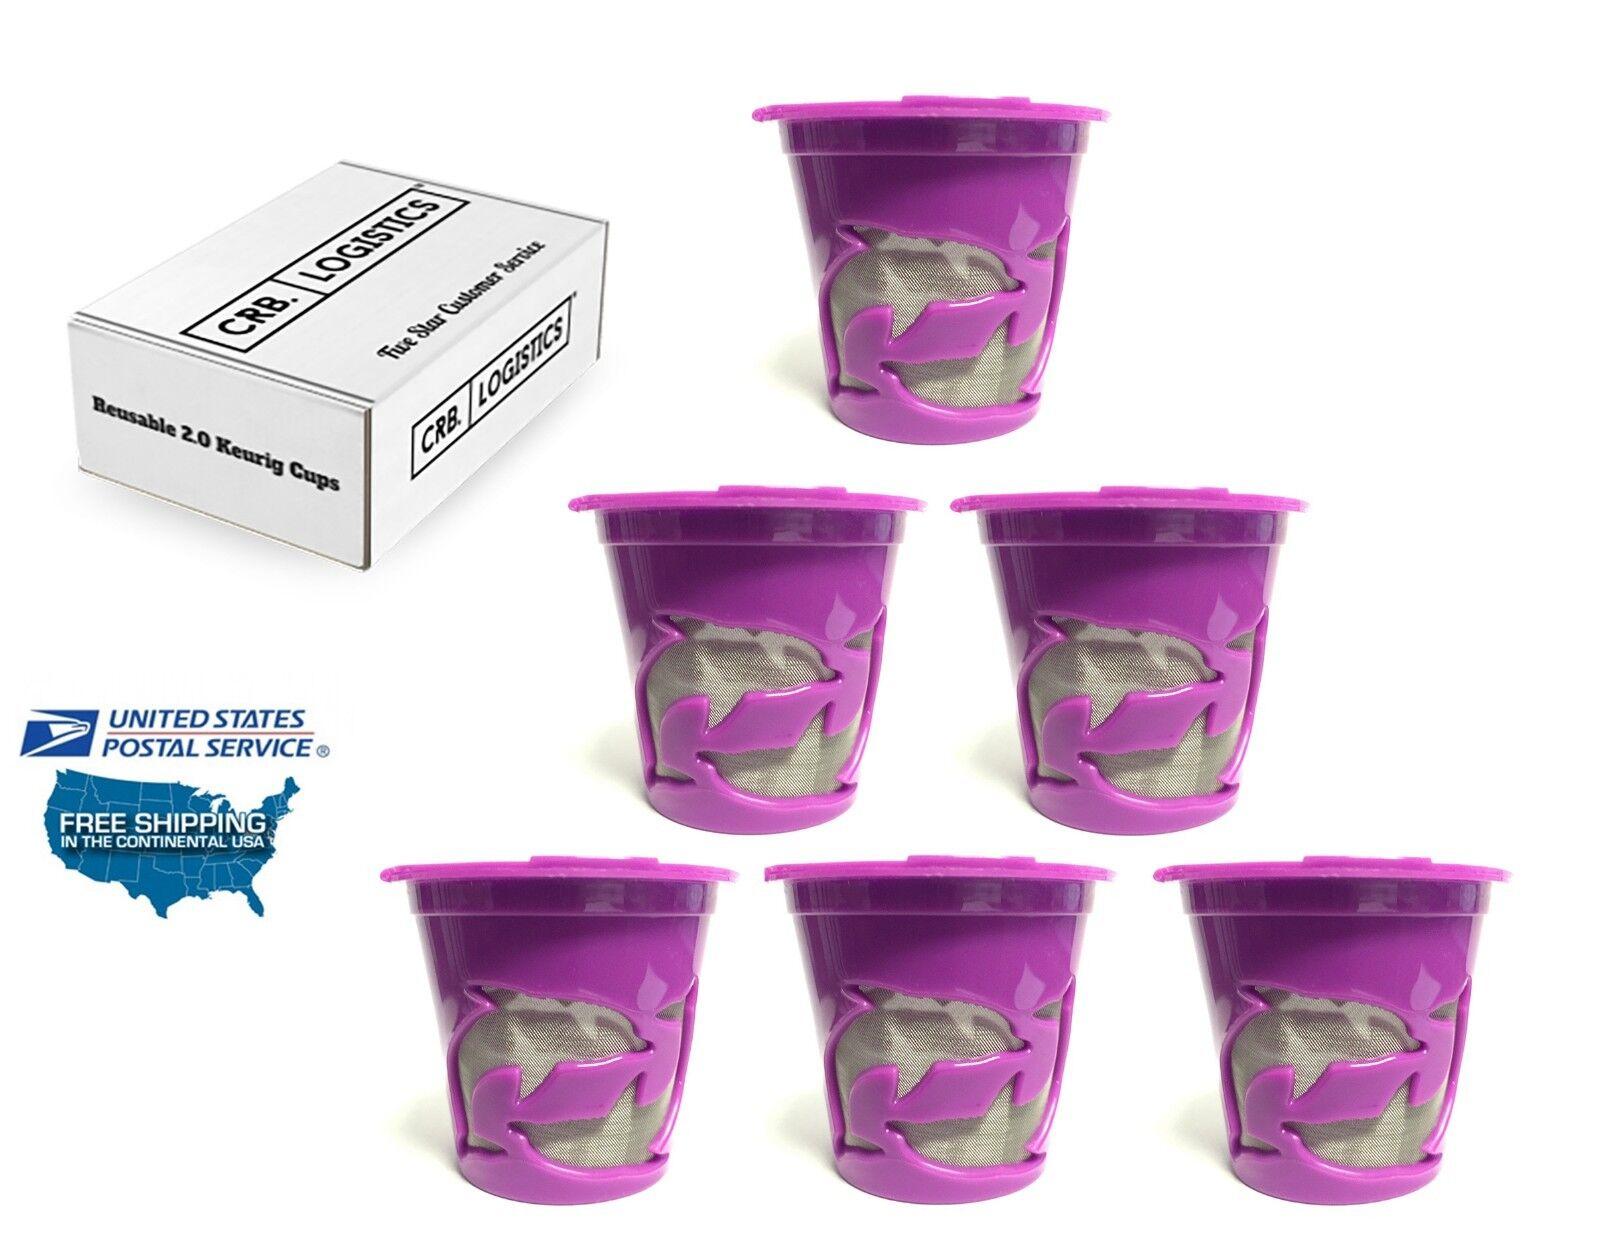 6 Reusable K cups